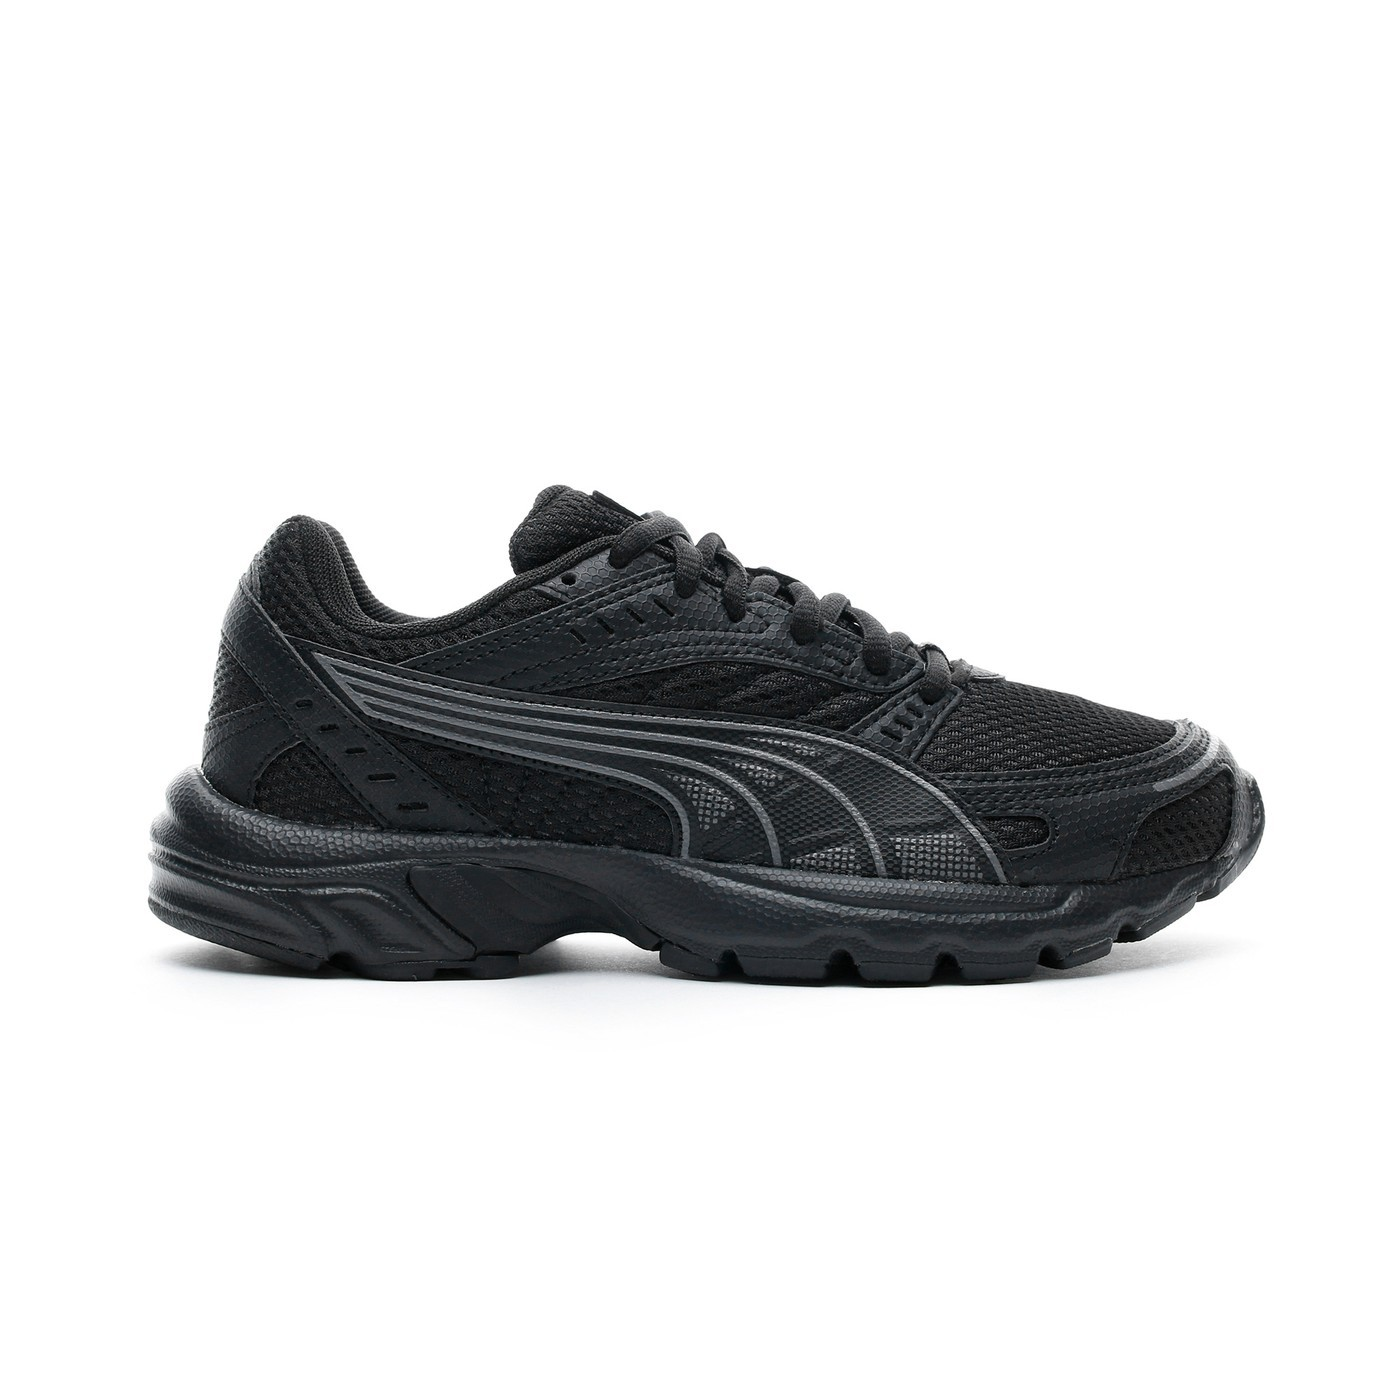 Puma Axis Unisex Siyah Spor Ayakkabı